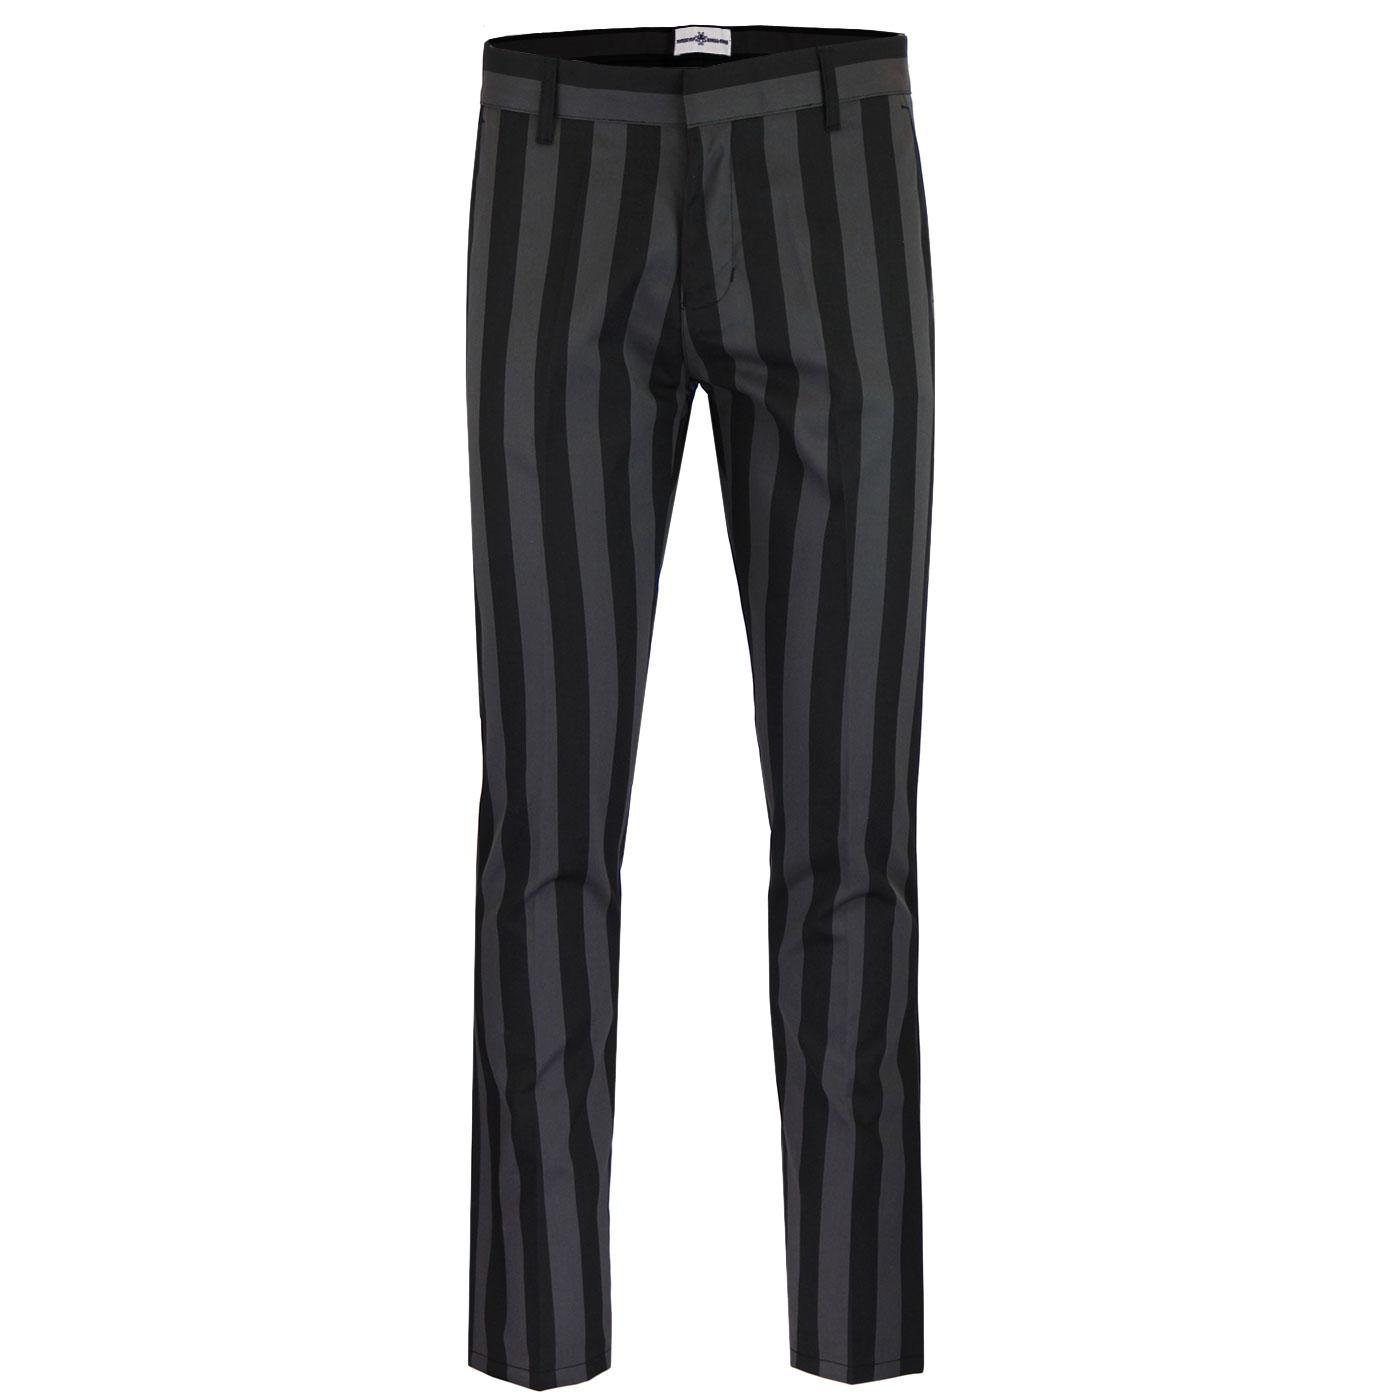 Inferno MADCAP ENGLAND Mod Slim Stripe Trousers BG